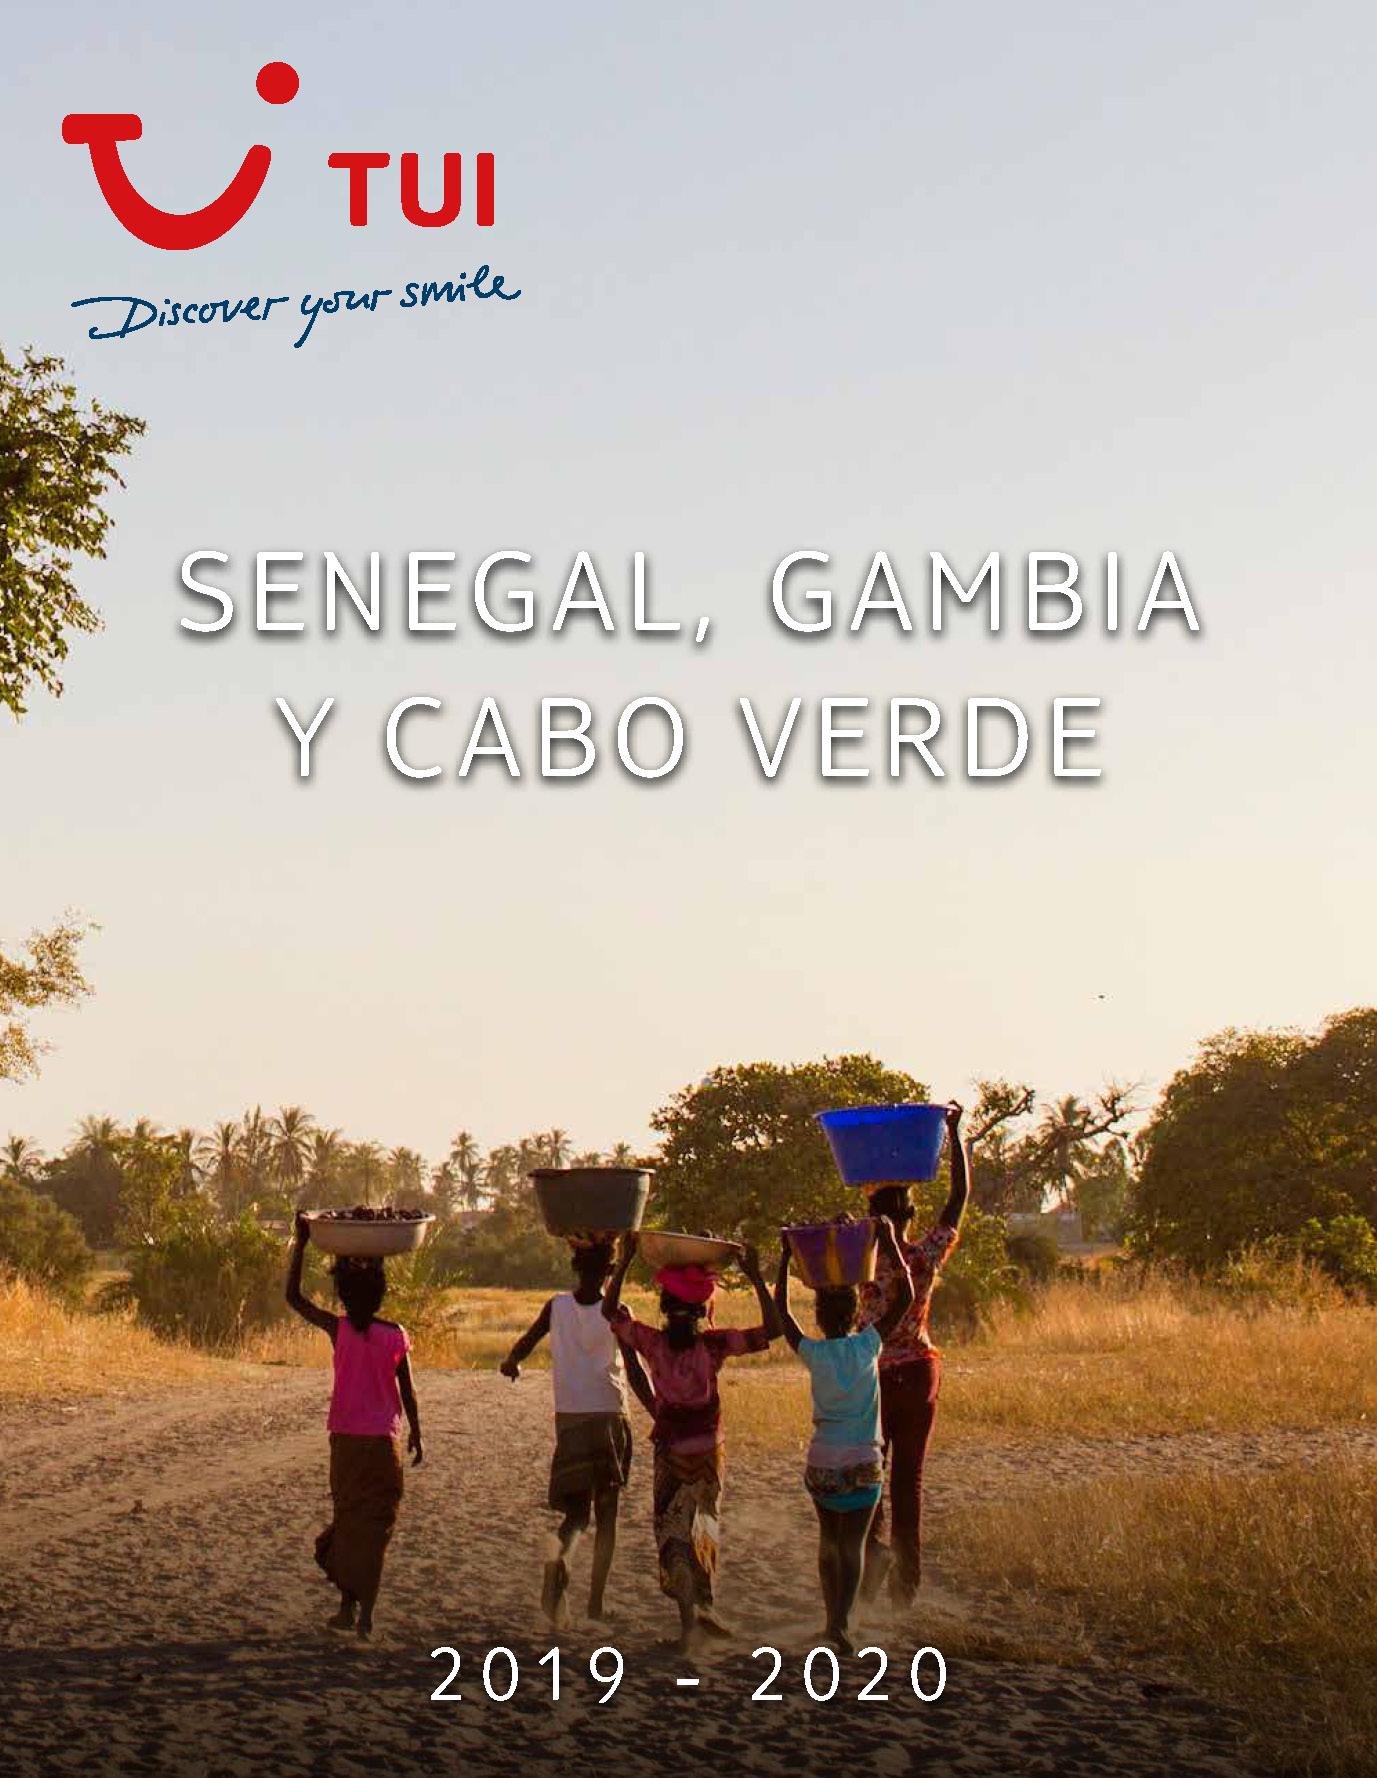 Catalogo TUI Ambassador Tours Senegal Gambia Cabo Verde 2019-2020